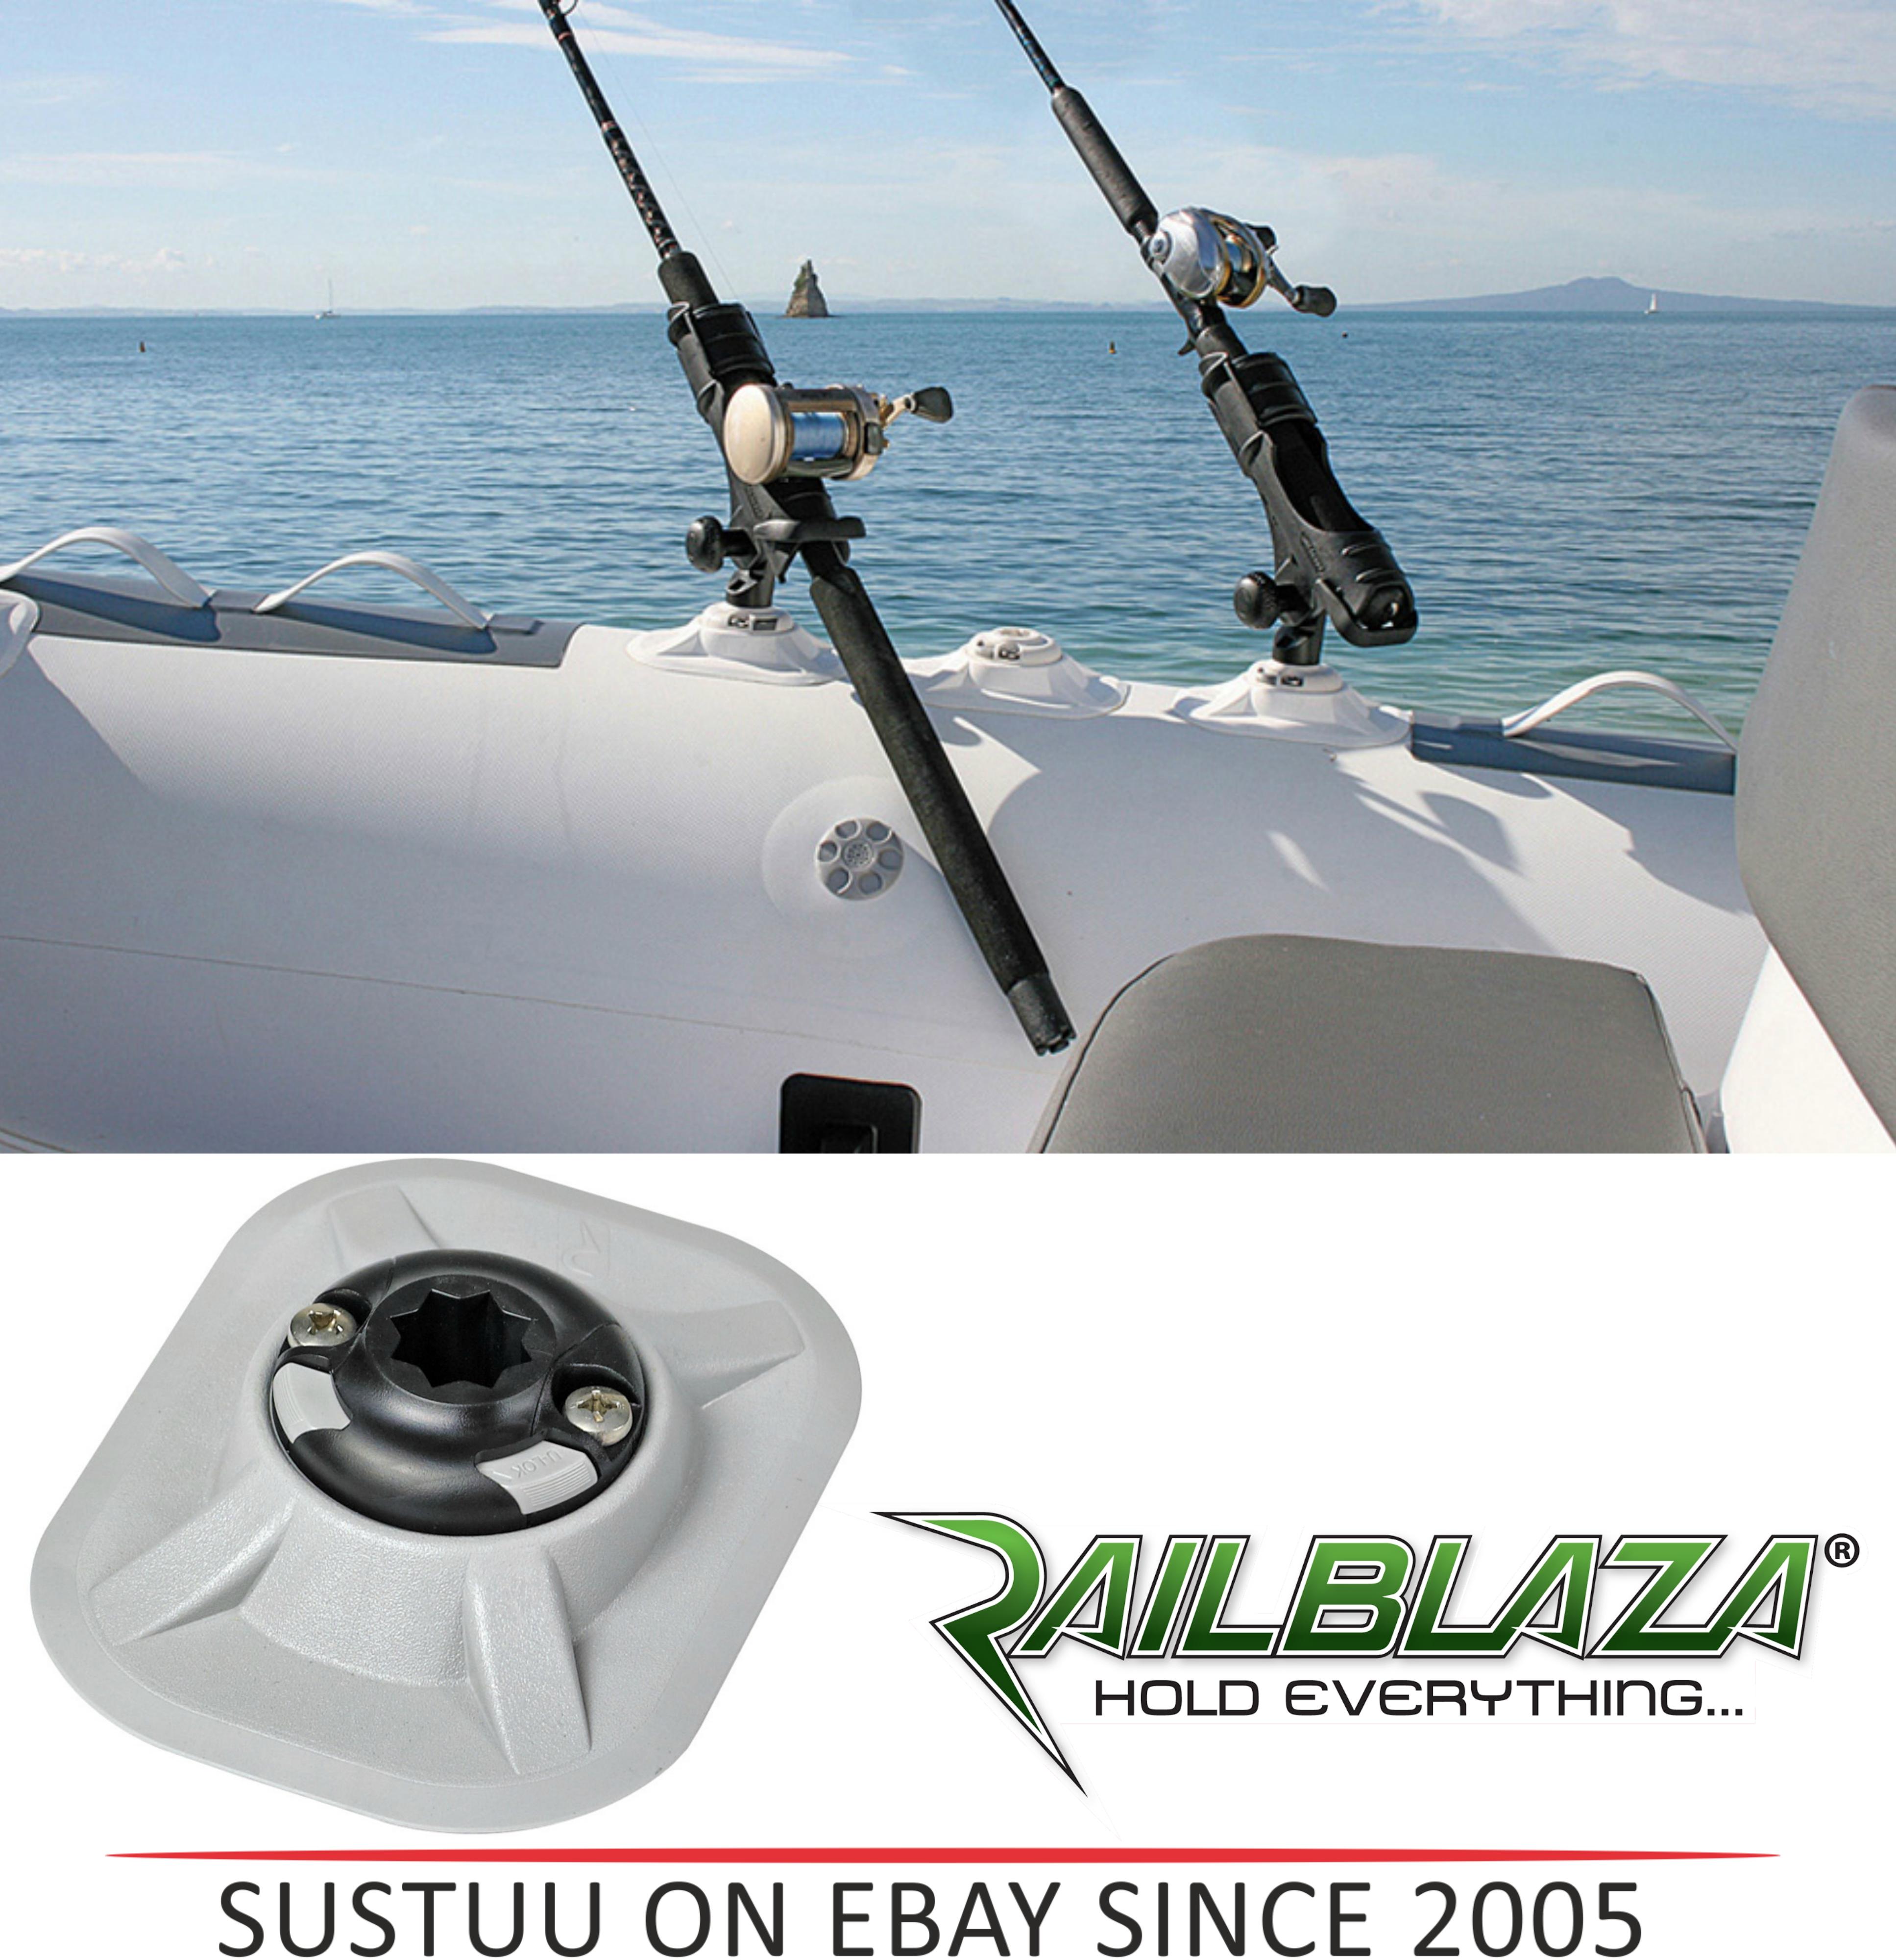 NEW Railblaza RIB Port inc StarPort|Inc 3M VHB Accessory|For Boats & Kayaks|Grey